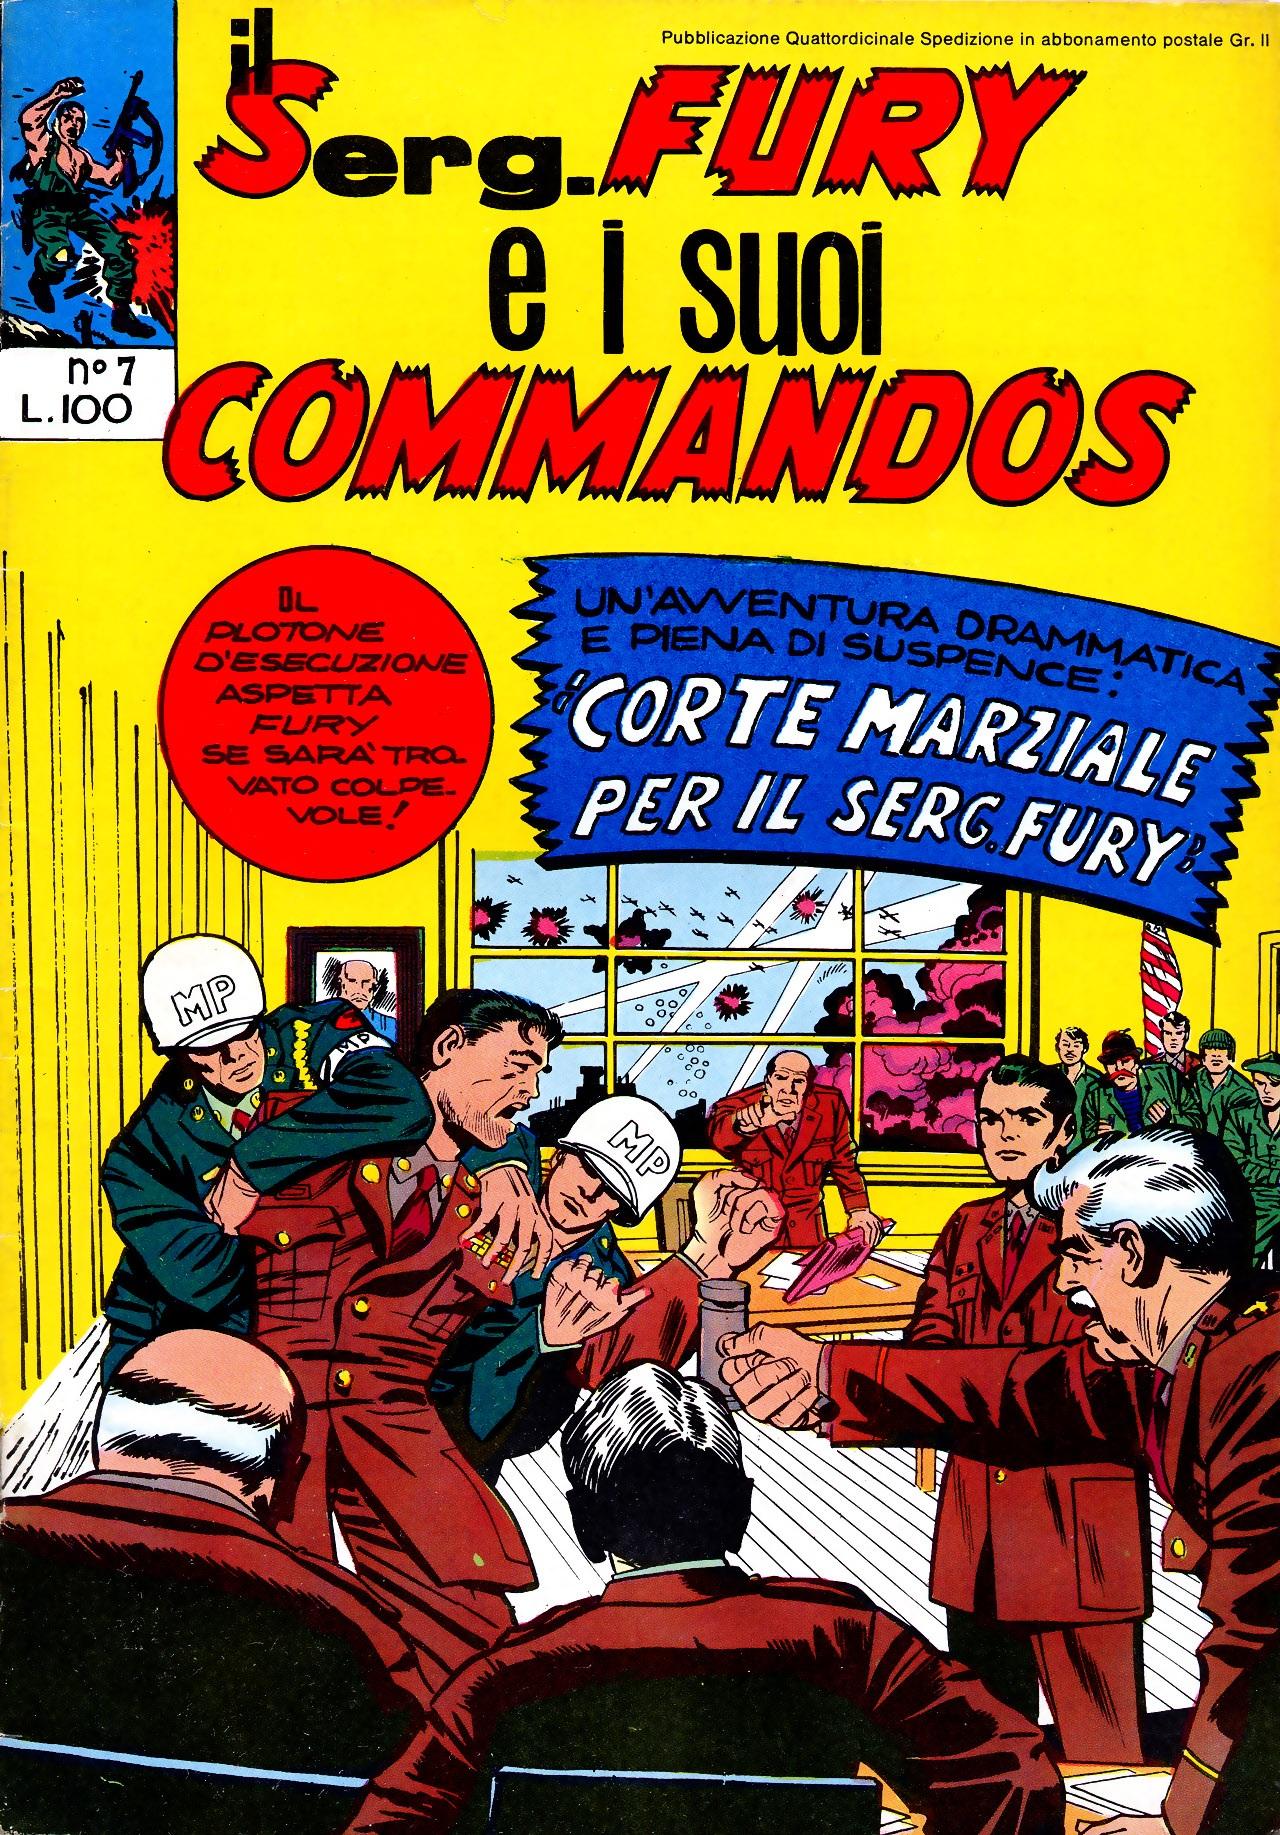 Il serg. Fury e i suoi commandos n. 7